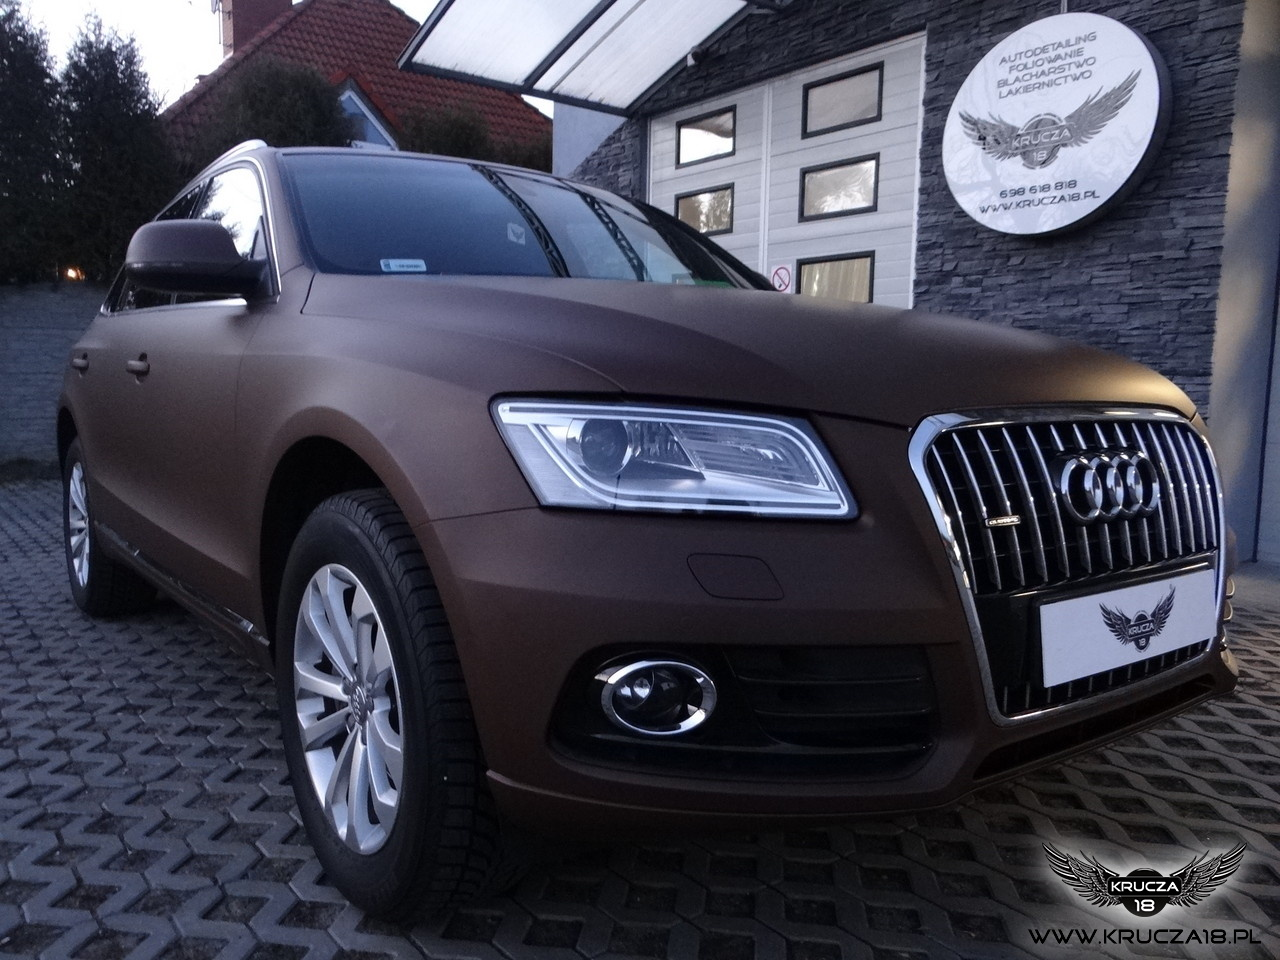 Audi-Chocolate Brown/Arlon